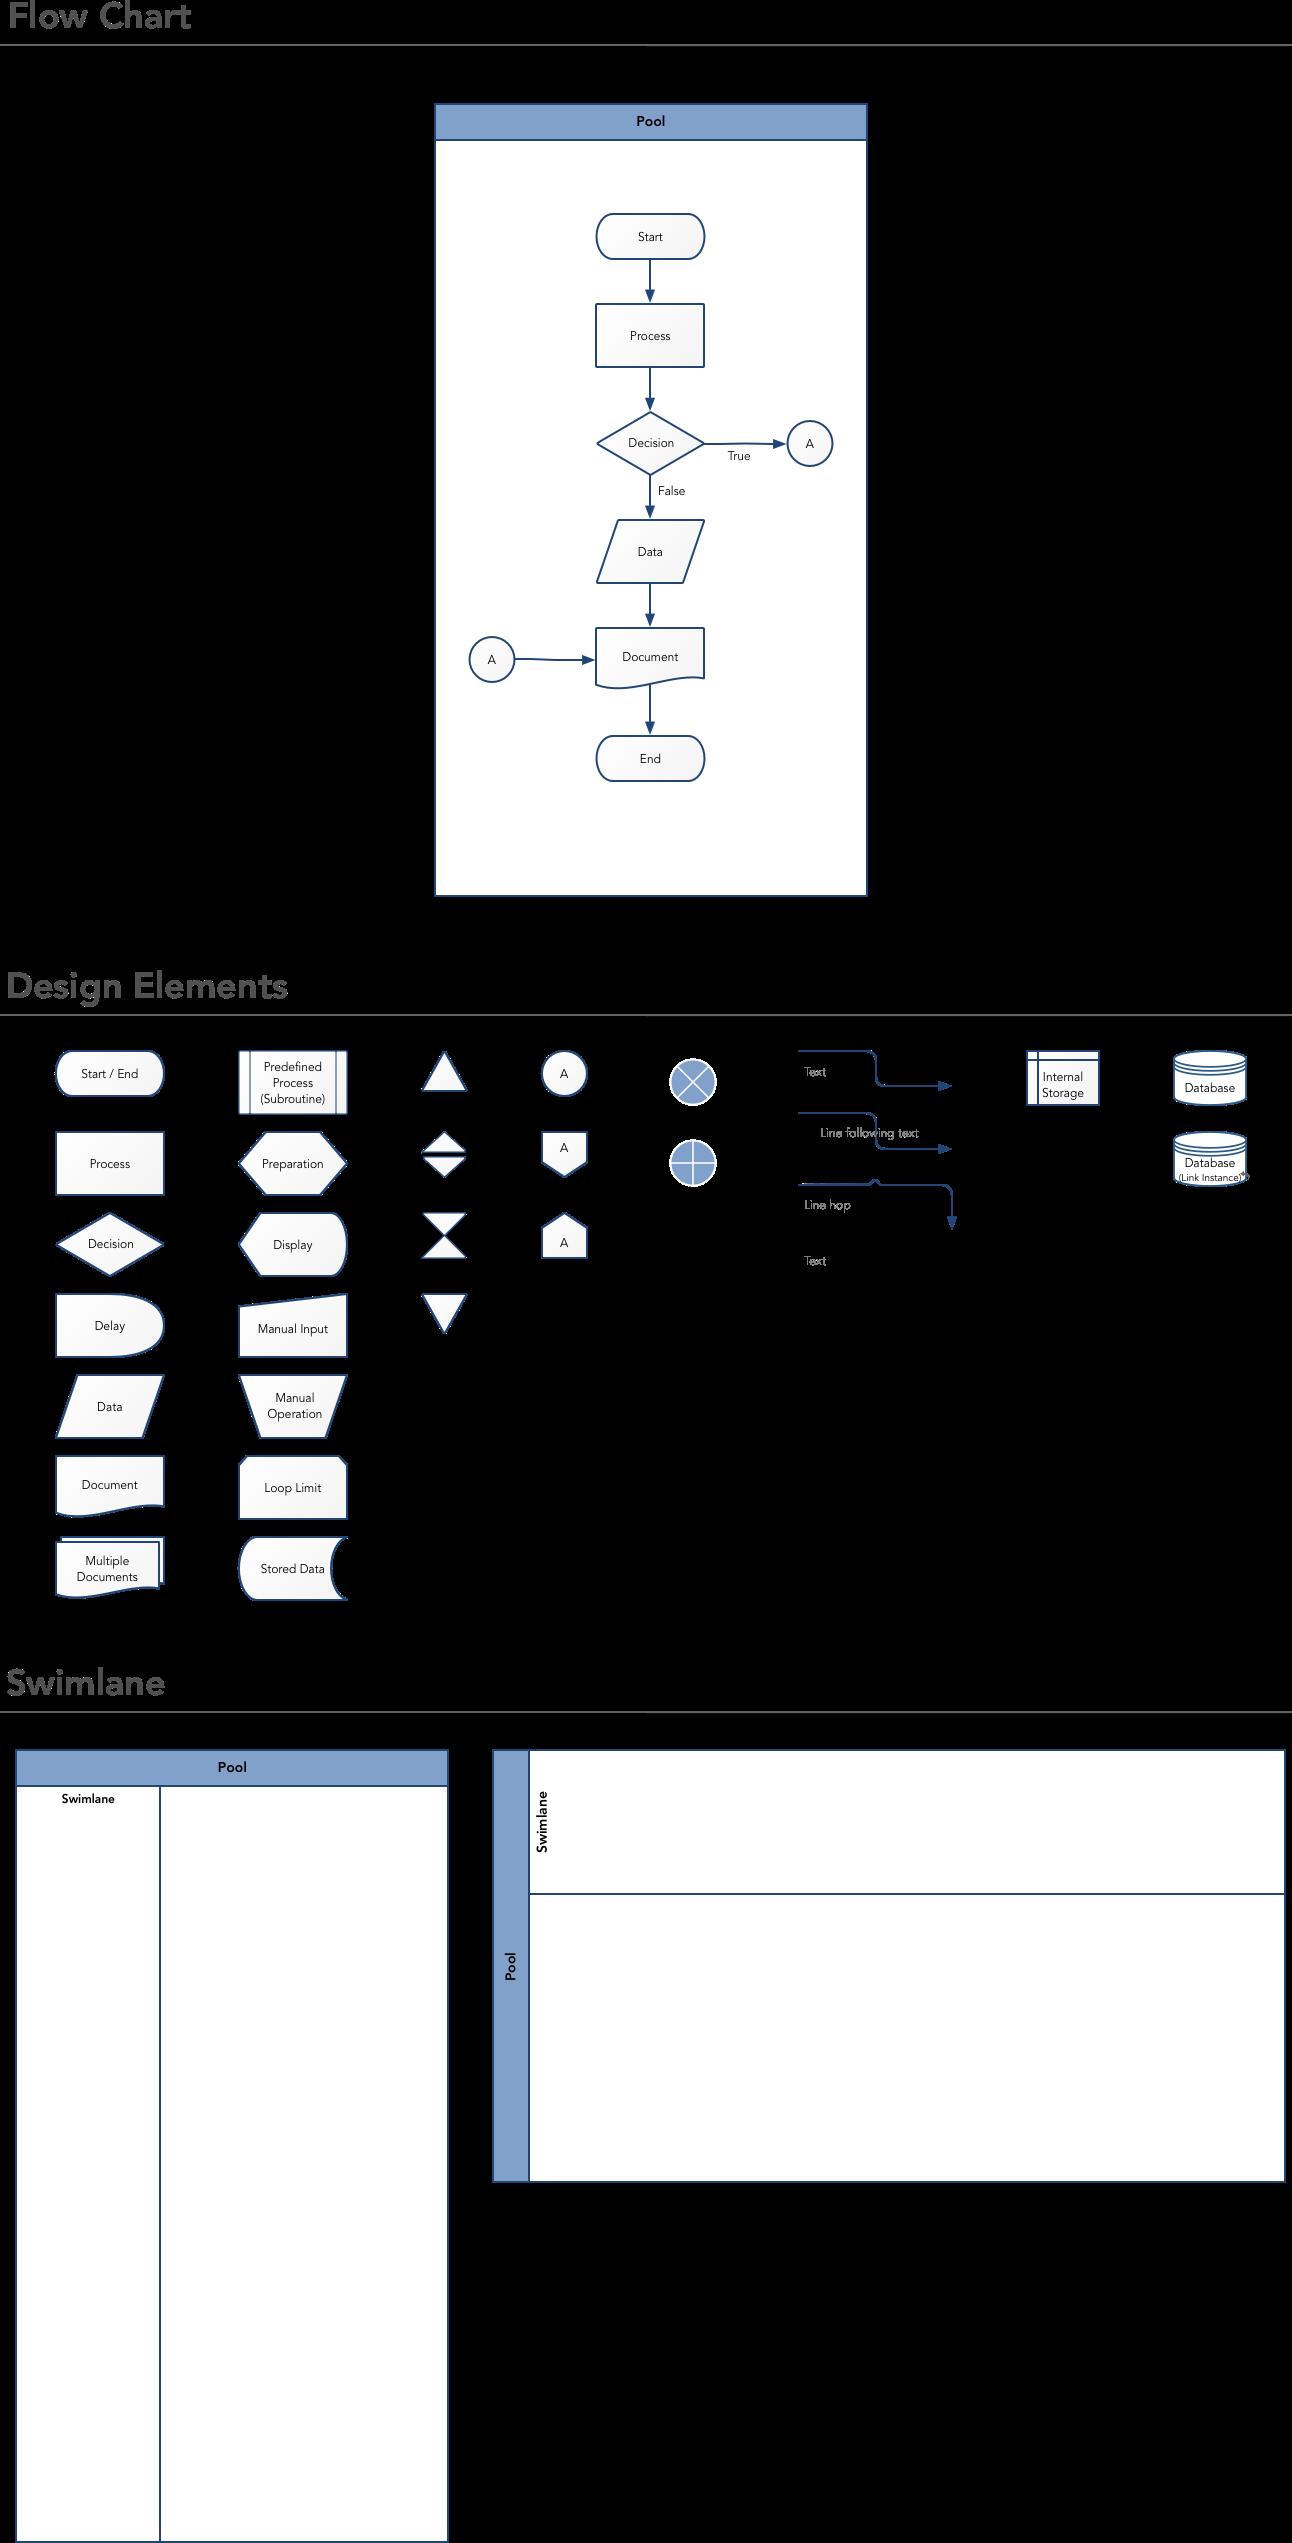 Traditional flow chart symbols graffletopia example design elements swimlane biocorpaavc Gallery